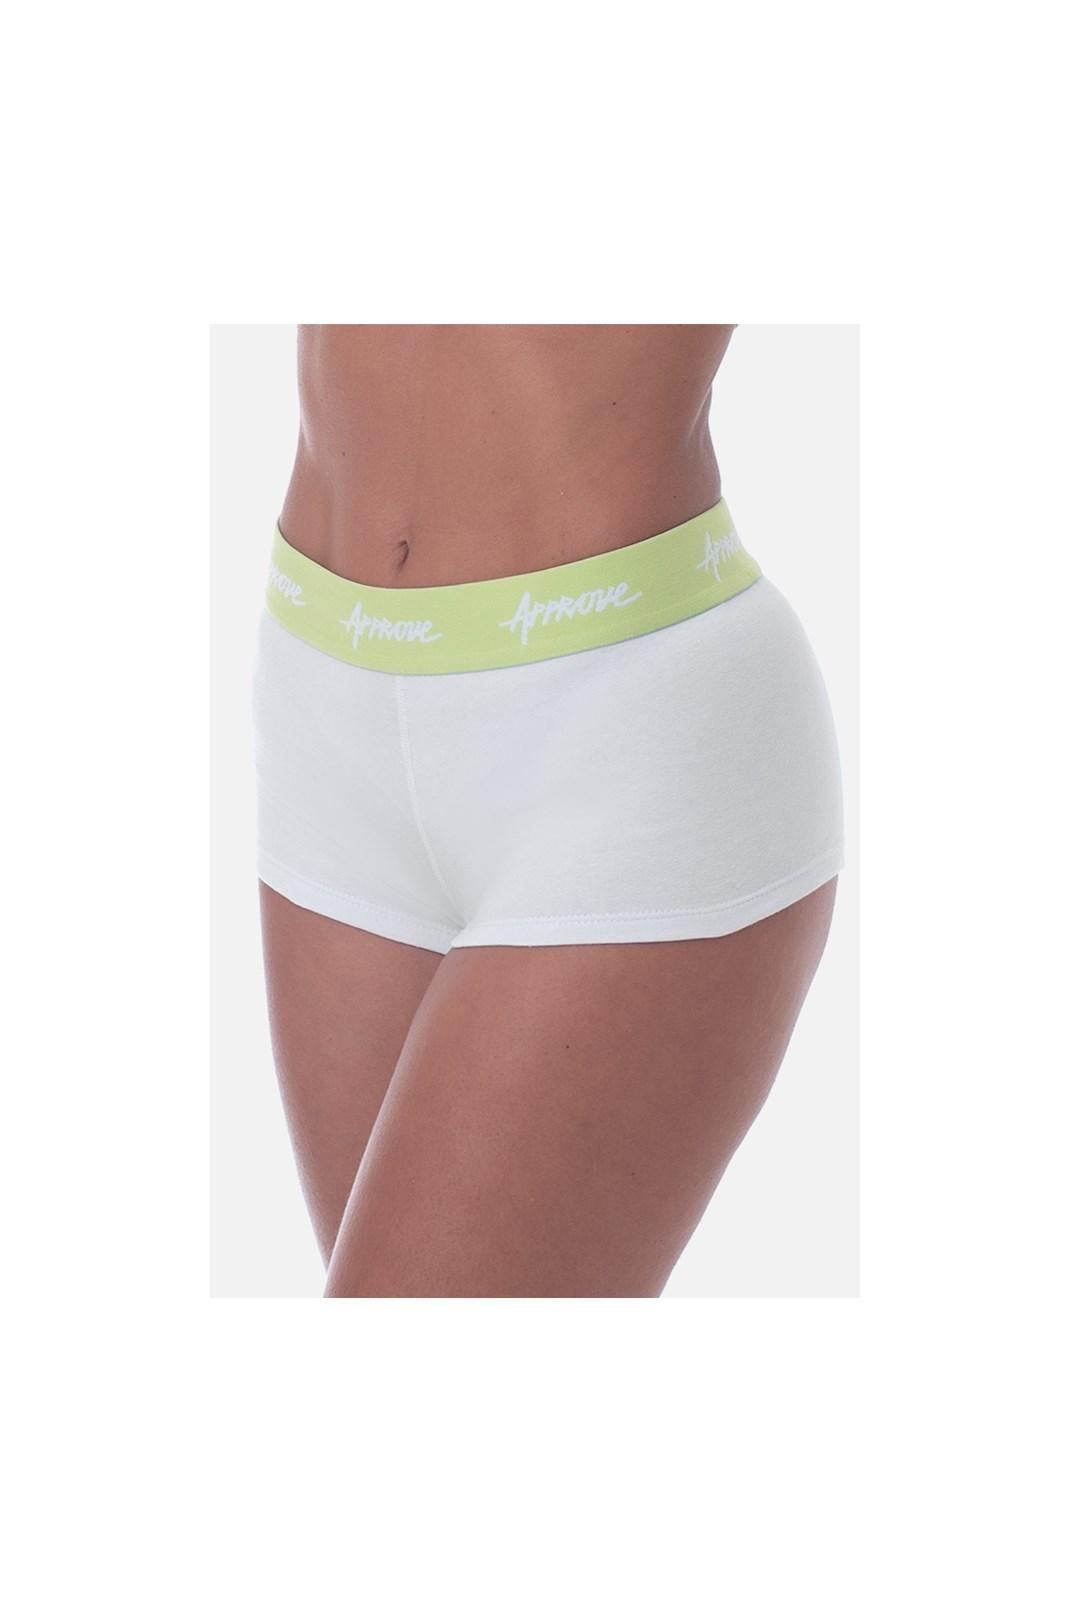 Shorts Underwear Approve Branco Com Verde